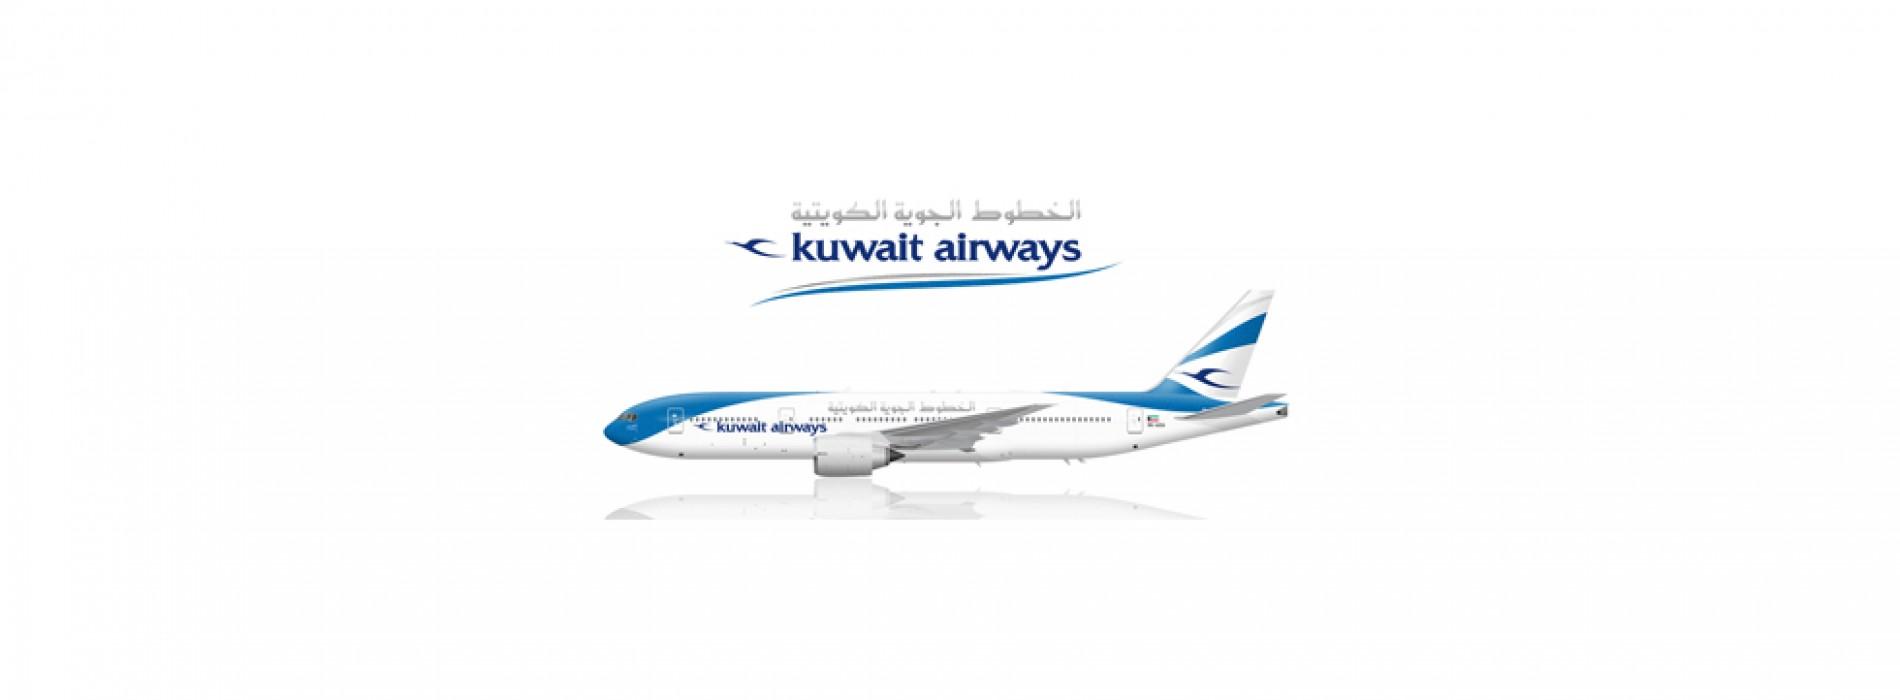 Kuwait Airways inks deal with Amadeus